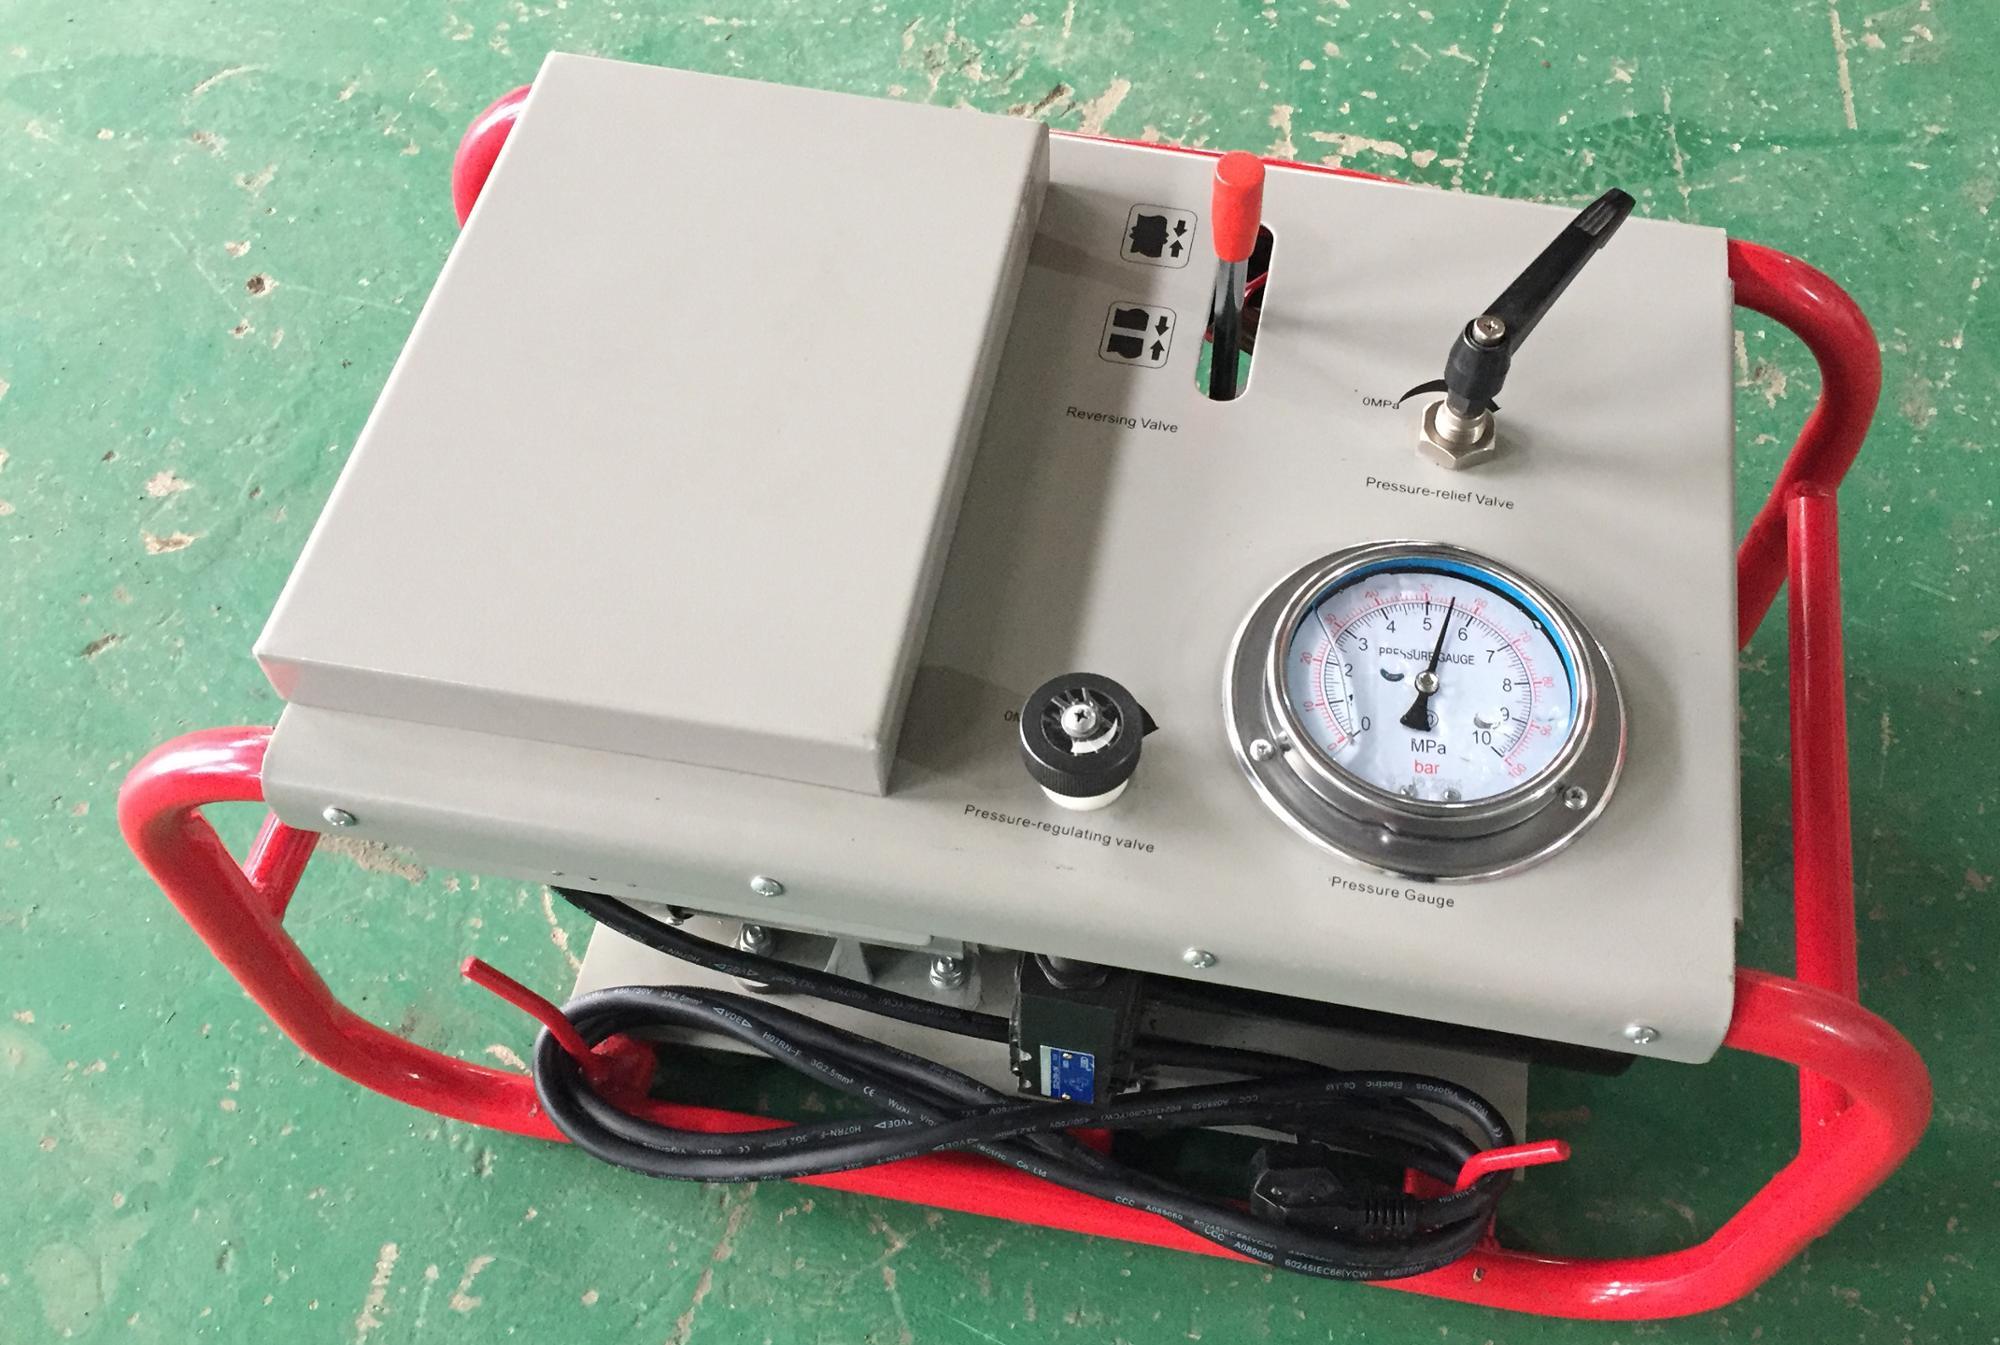 SDD315 fabrikant beste kwaliteit PE pijp butt fusion lasmachine voor lassen machine plastic gas pijp